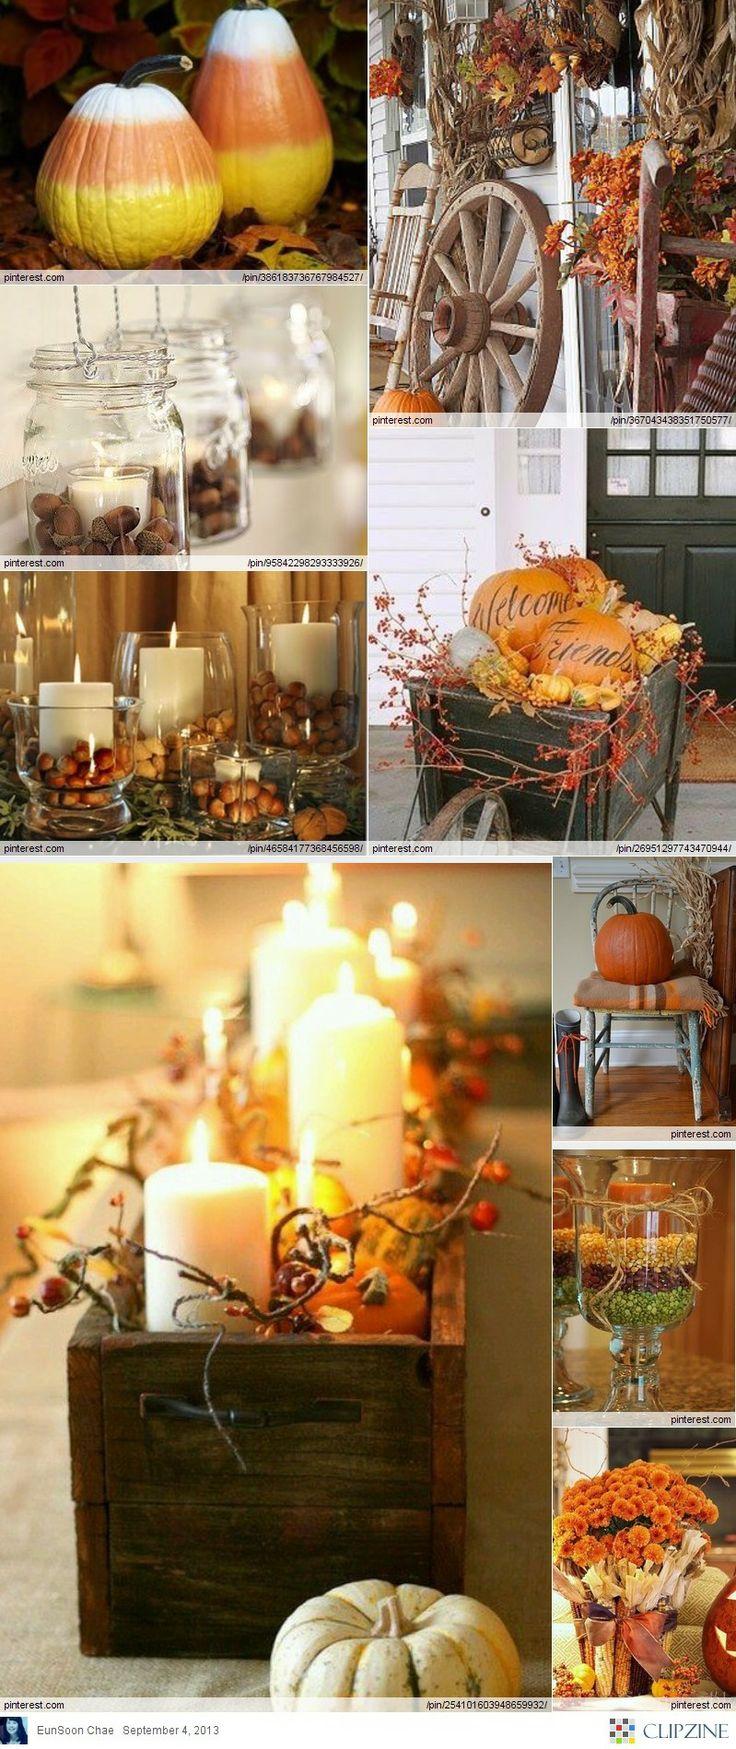 fall decorating ideas halloween pinterest. Black Bedroom Furniture Sets. Home Design Ideas